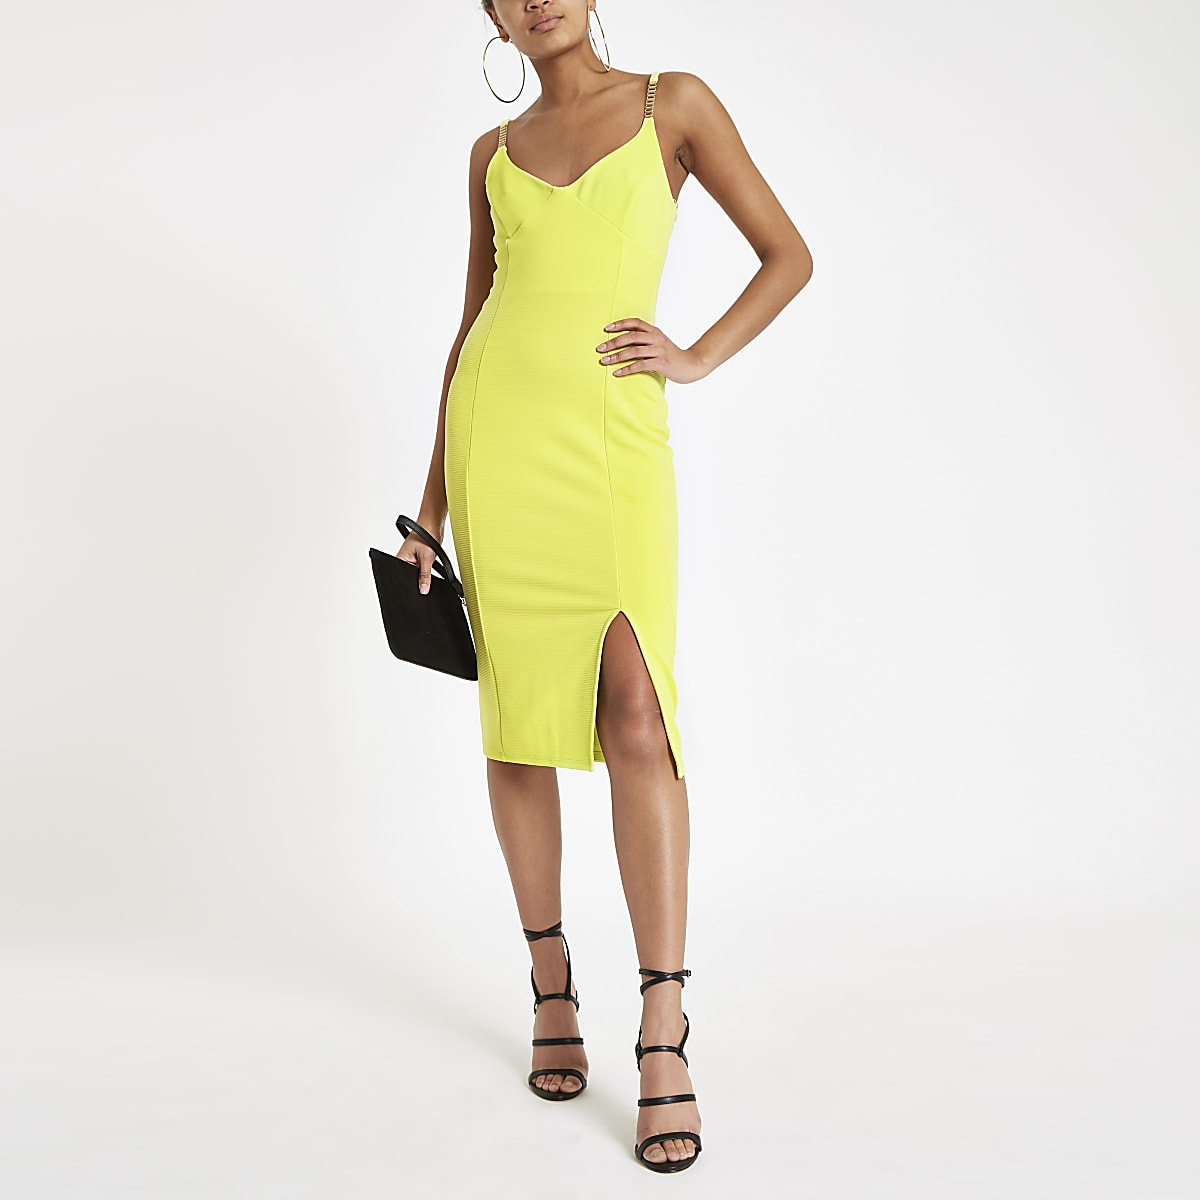 a79493979941 Bright yellow ribbed diamante trim midi dress - Bodycon Dresses - Dresses -  women